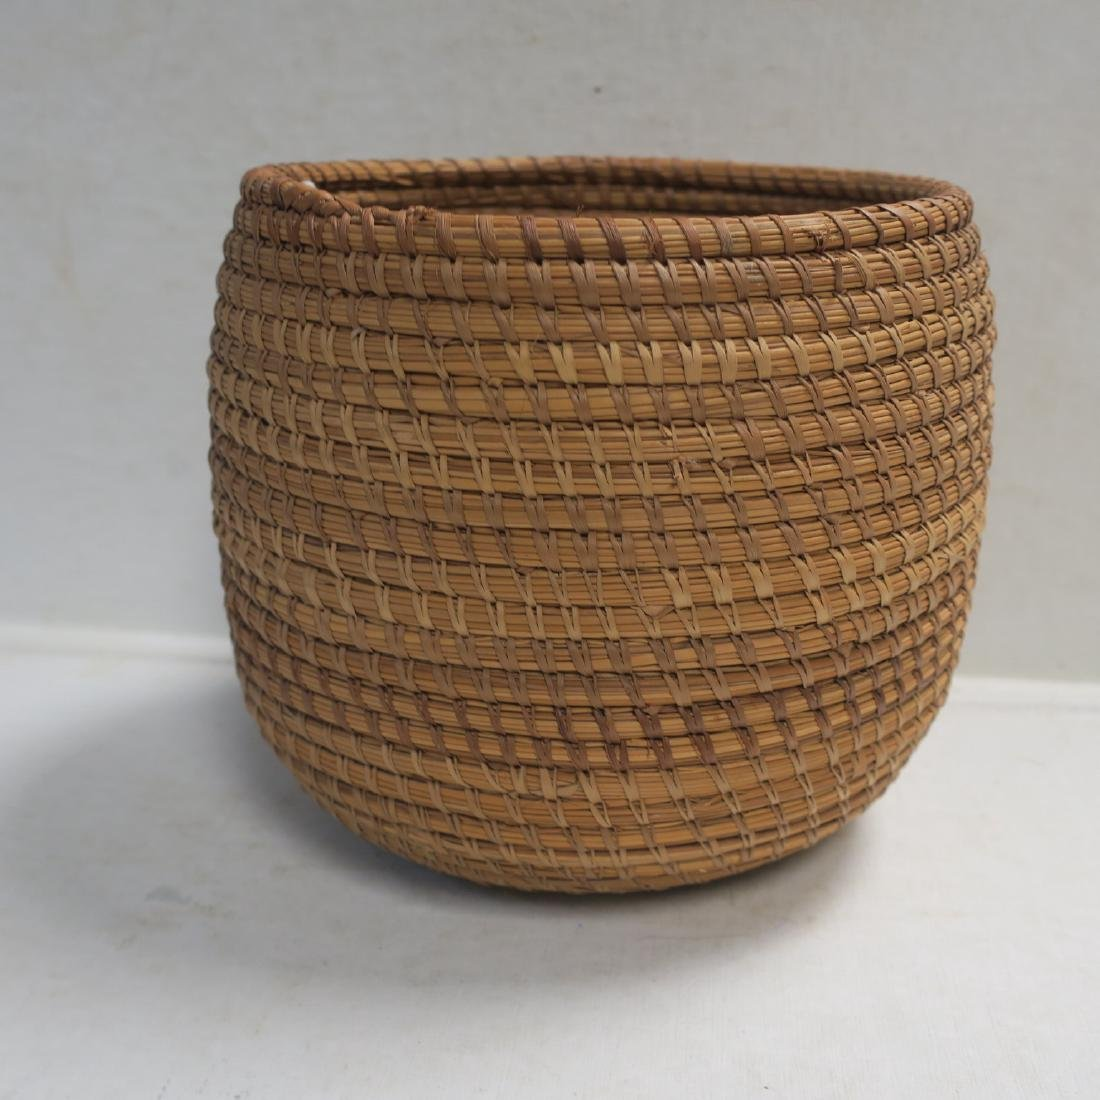 Handmade Natural Woven Coil Basket: